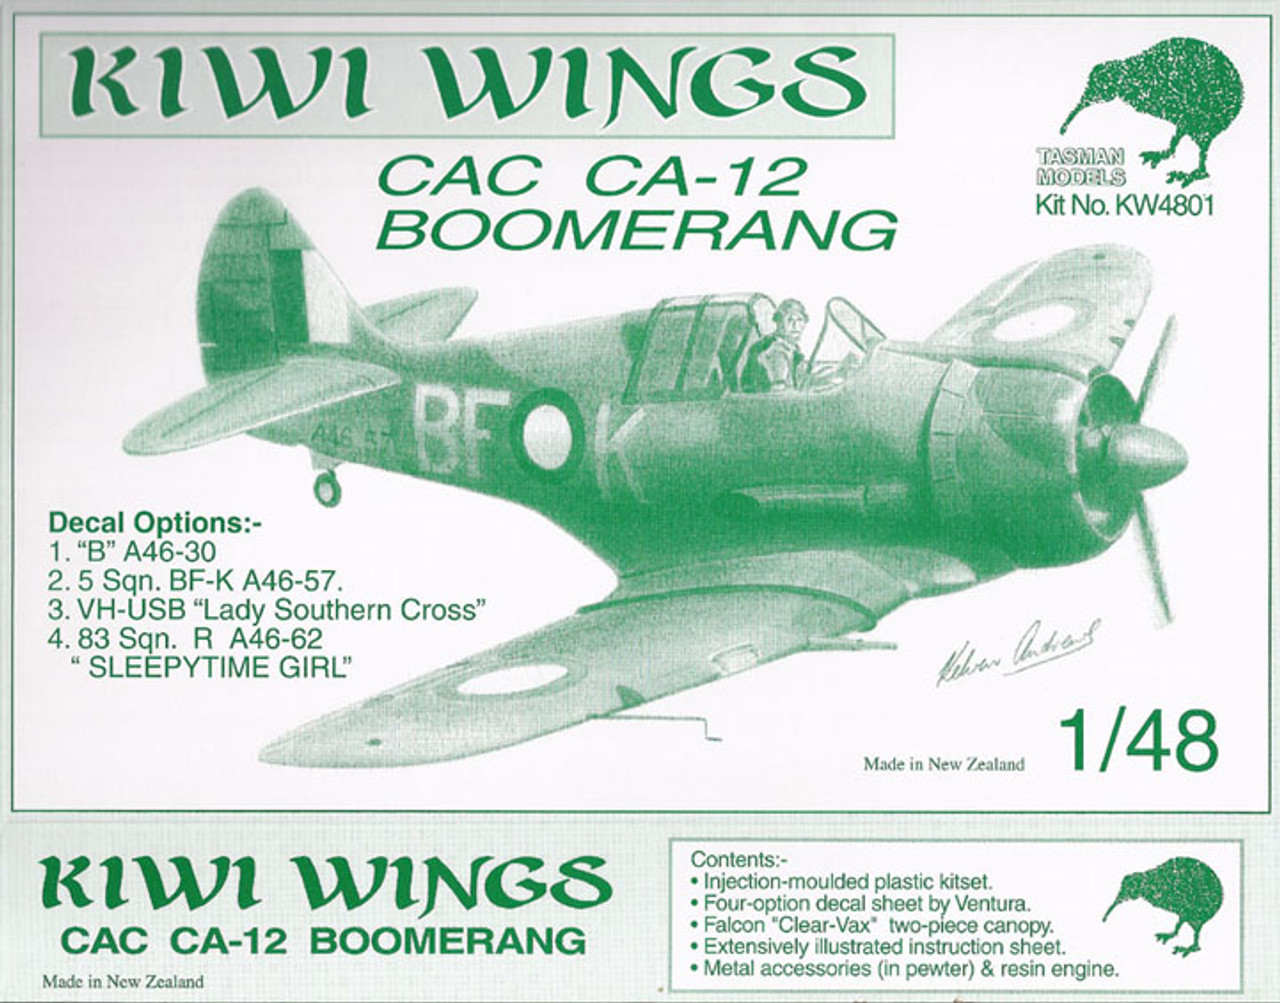 Kiwi Wings CAC CA-12 Boomerang Kit 1:48 (KW4801)